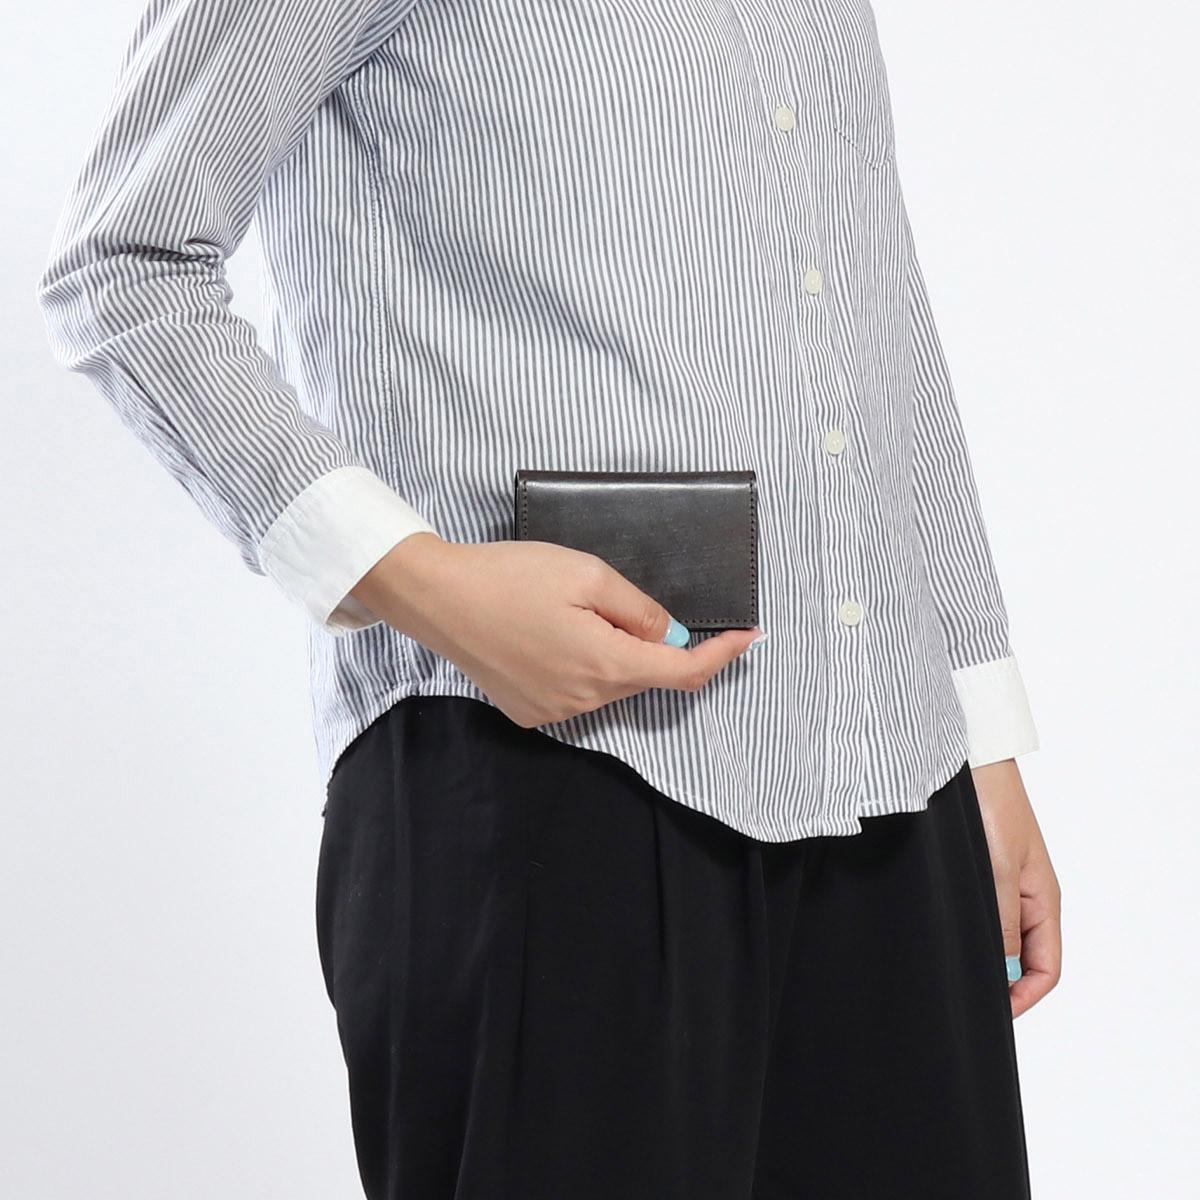 ed49923e0aaf HERGOPOCH Bridle Series Business Card Holder Card Case Men s Leather  Business Made in Japan BLW-NAM